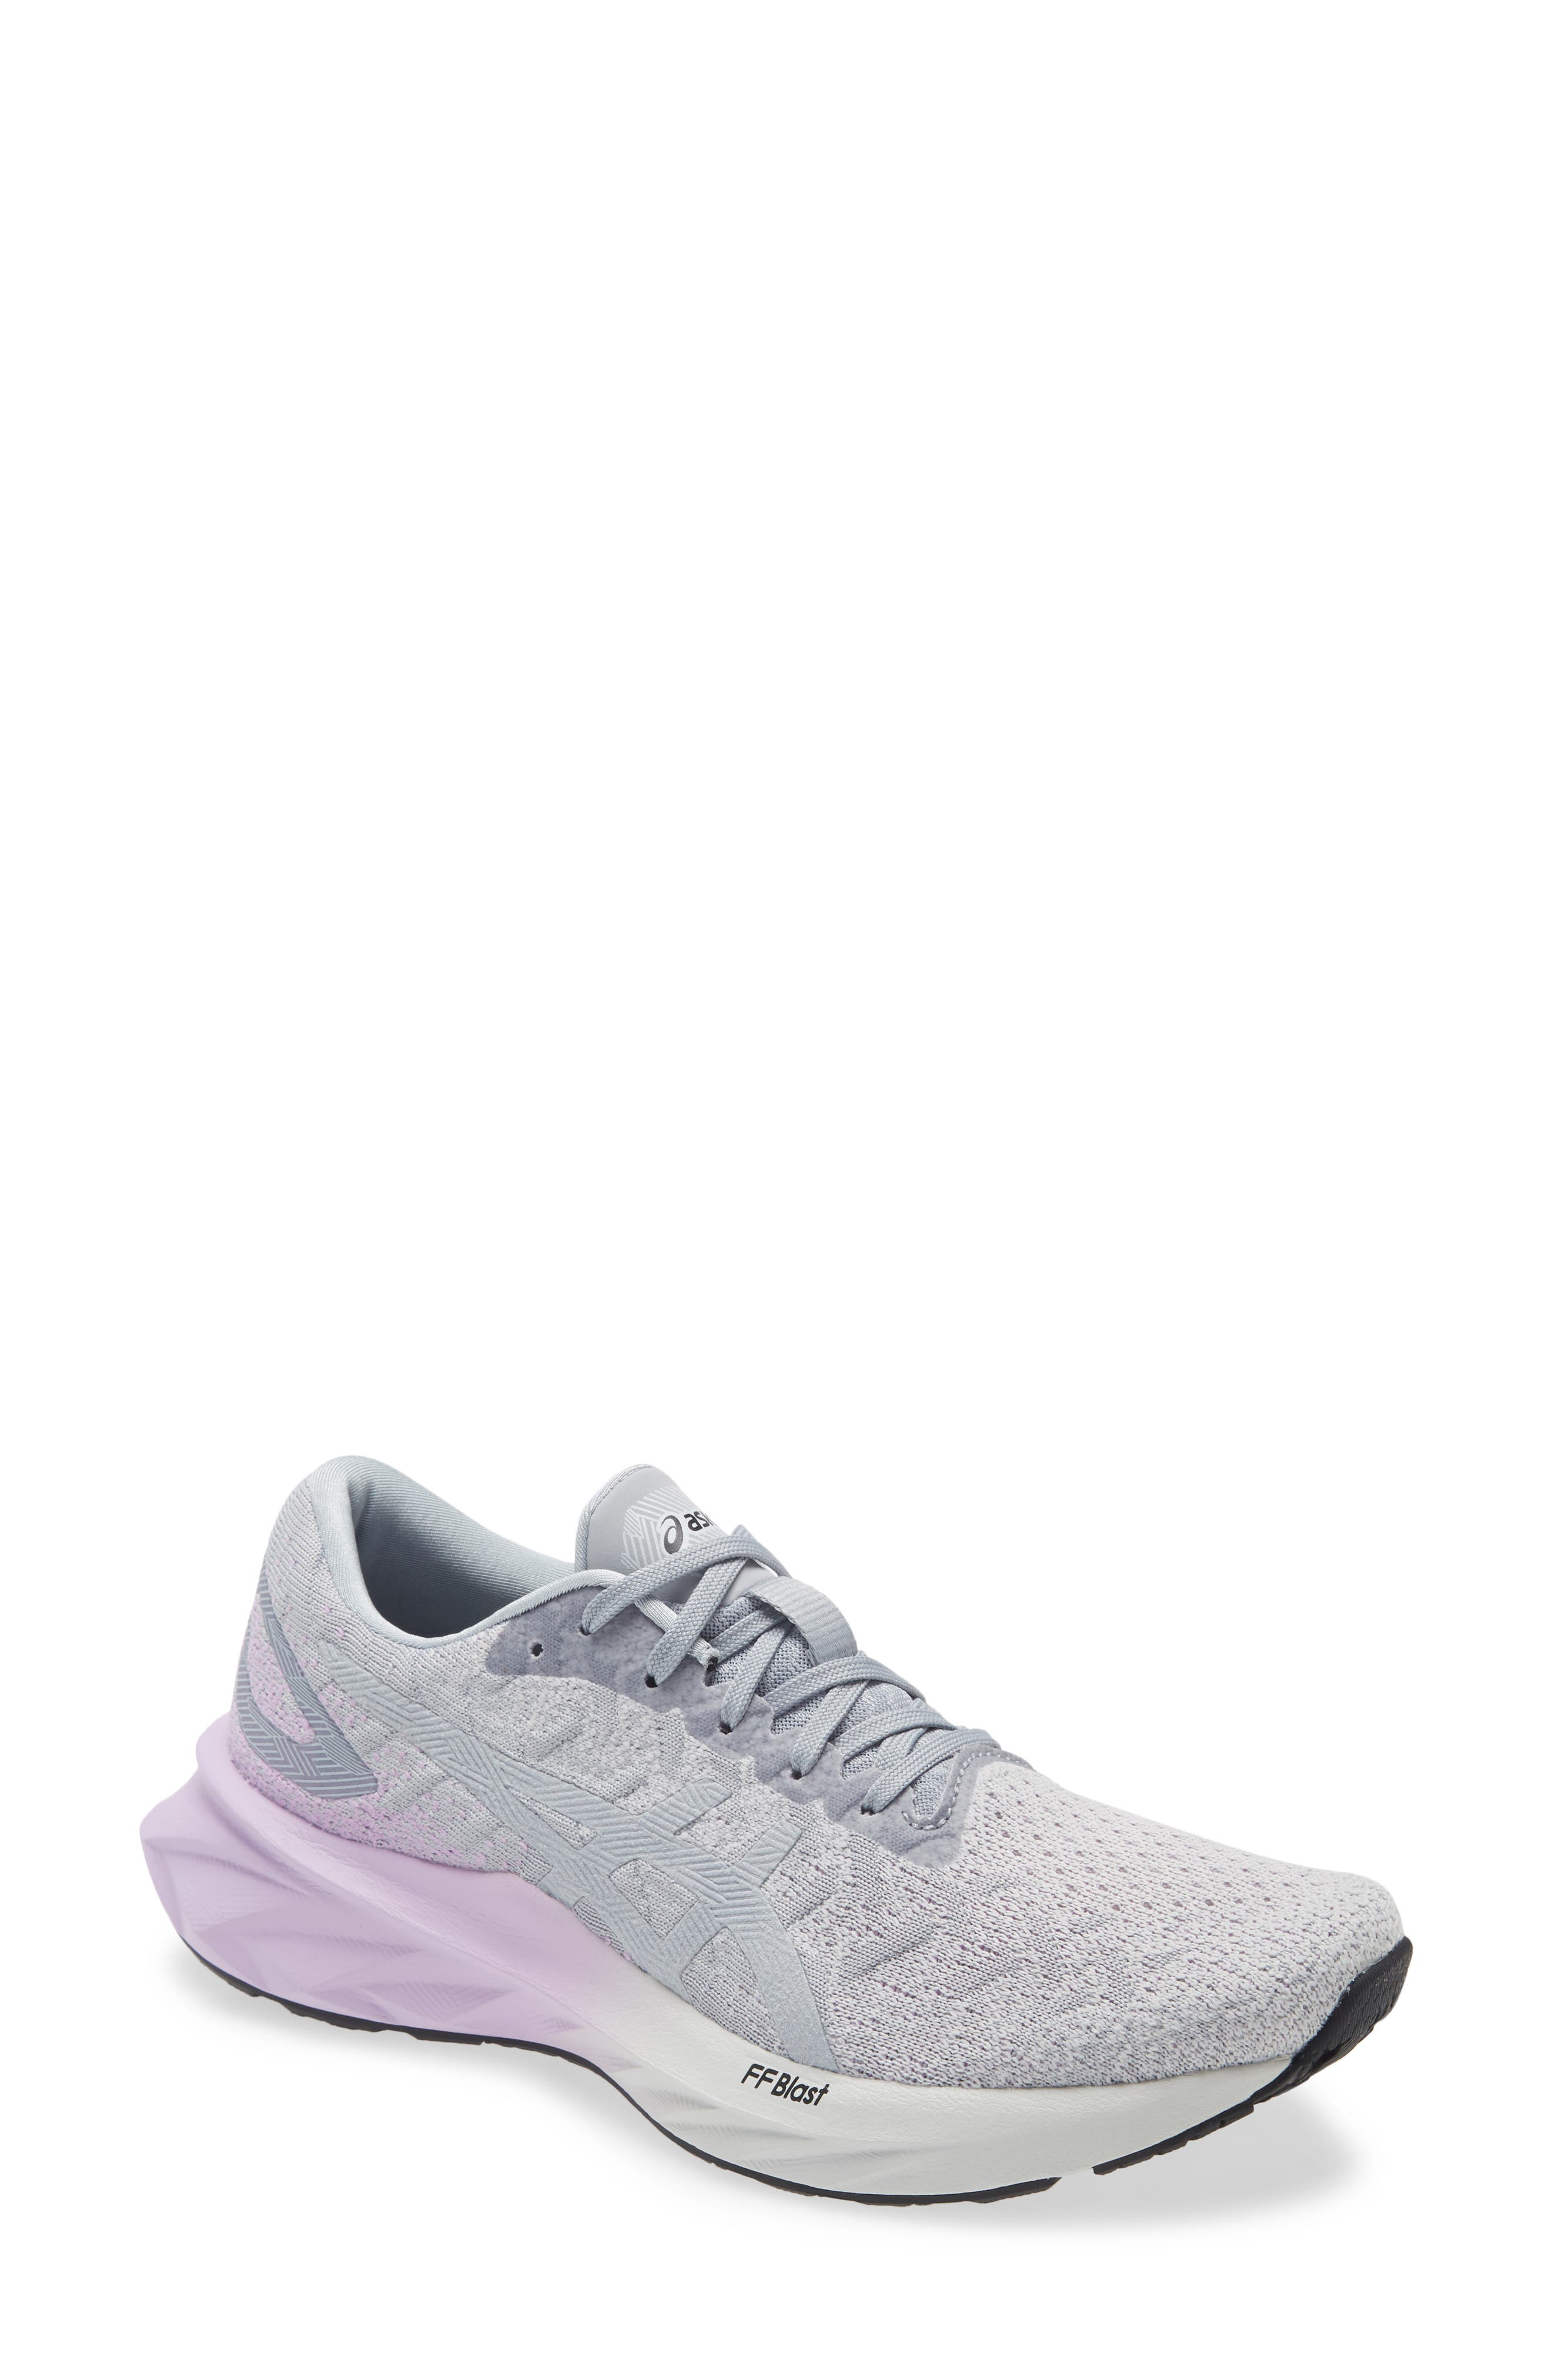 Women's Asics Dynablast Running Shoe